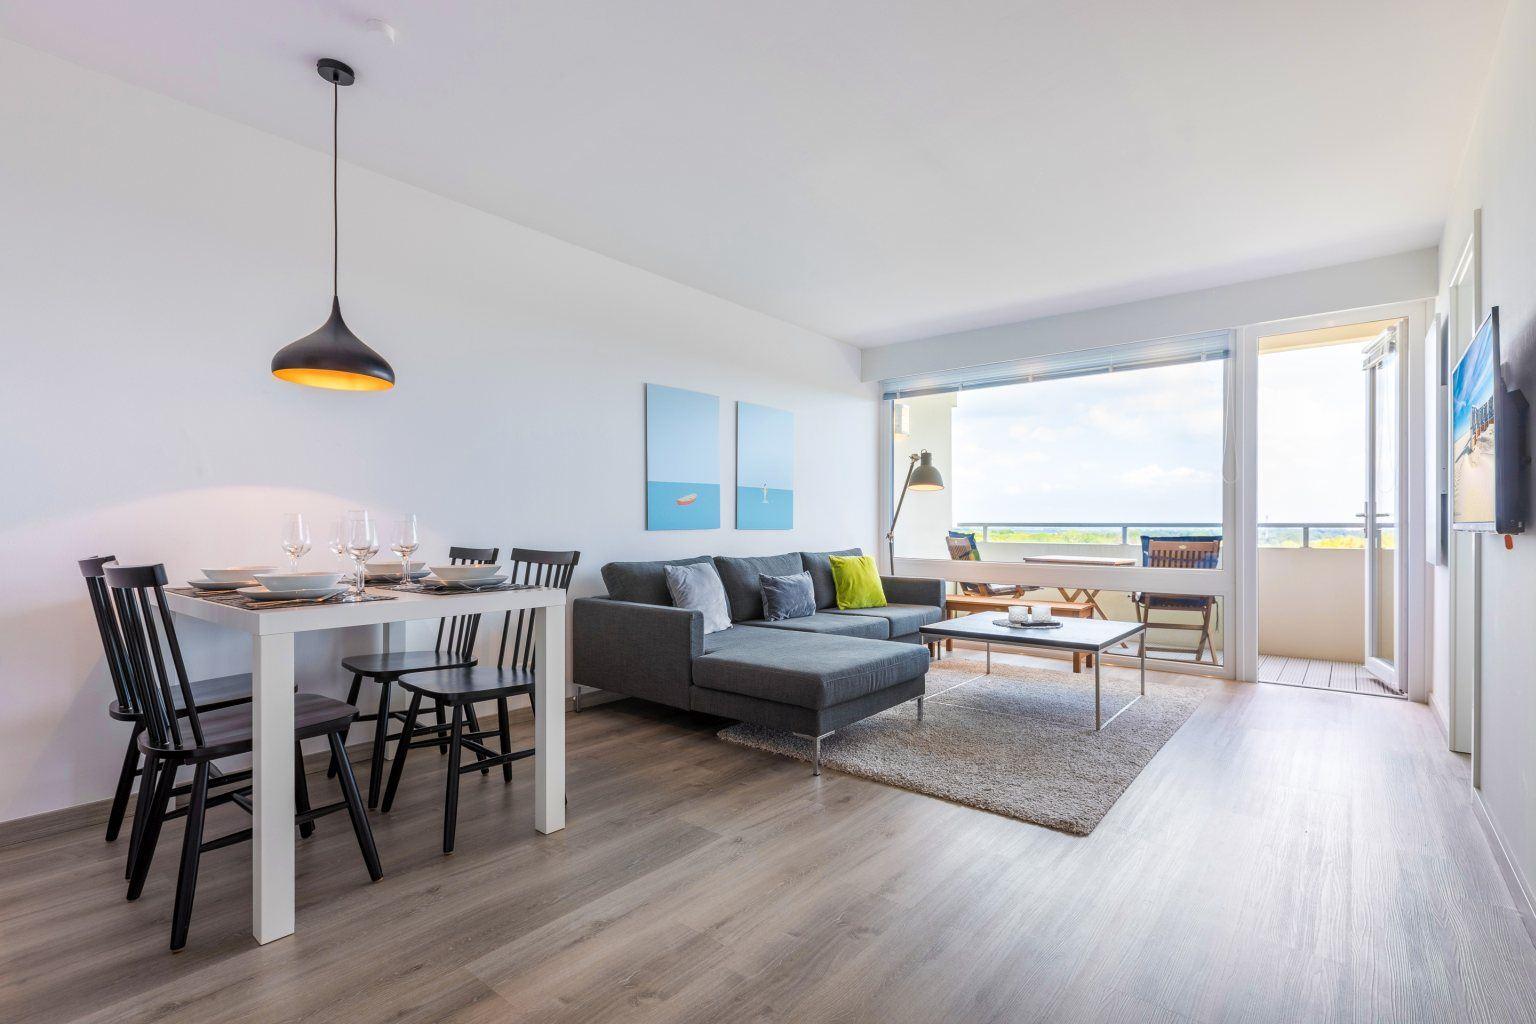 "Wohnzimmer - St Peter Ording Bad, Haus Atlantic, Wohnung 133 ""Nordmeer"""